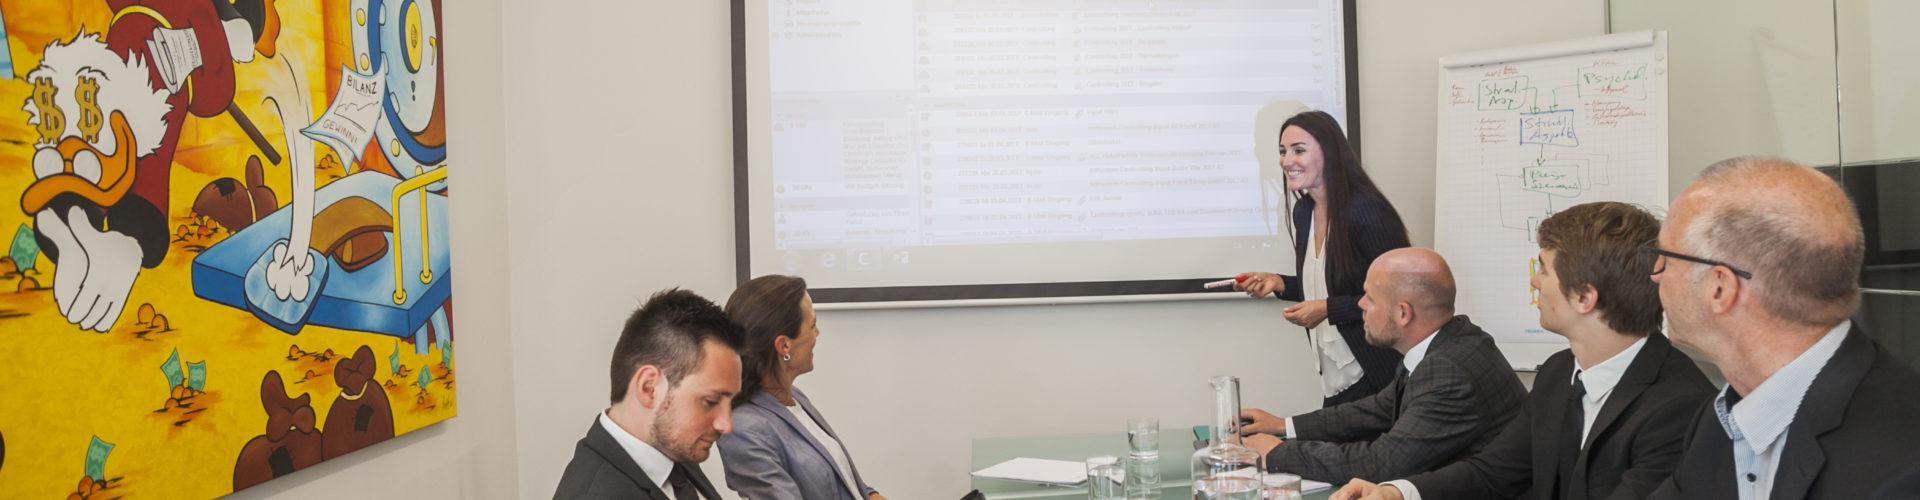 Preisstrategie, Dr. Christoph Nussbaumer Strategy Consultants GmbH